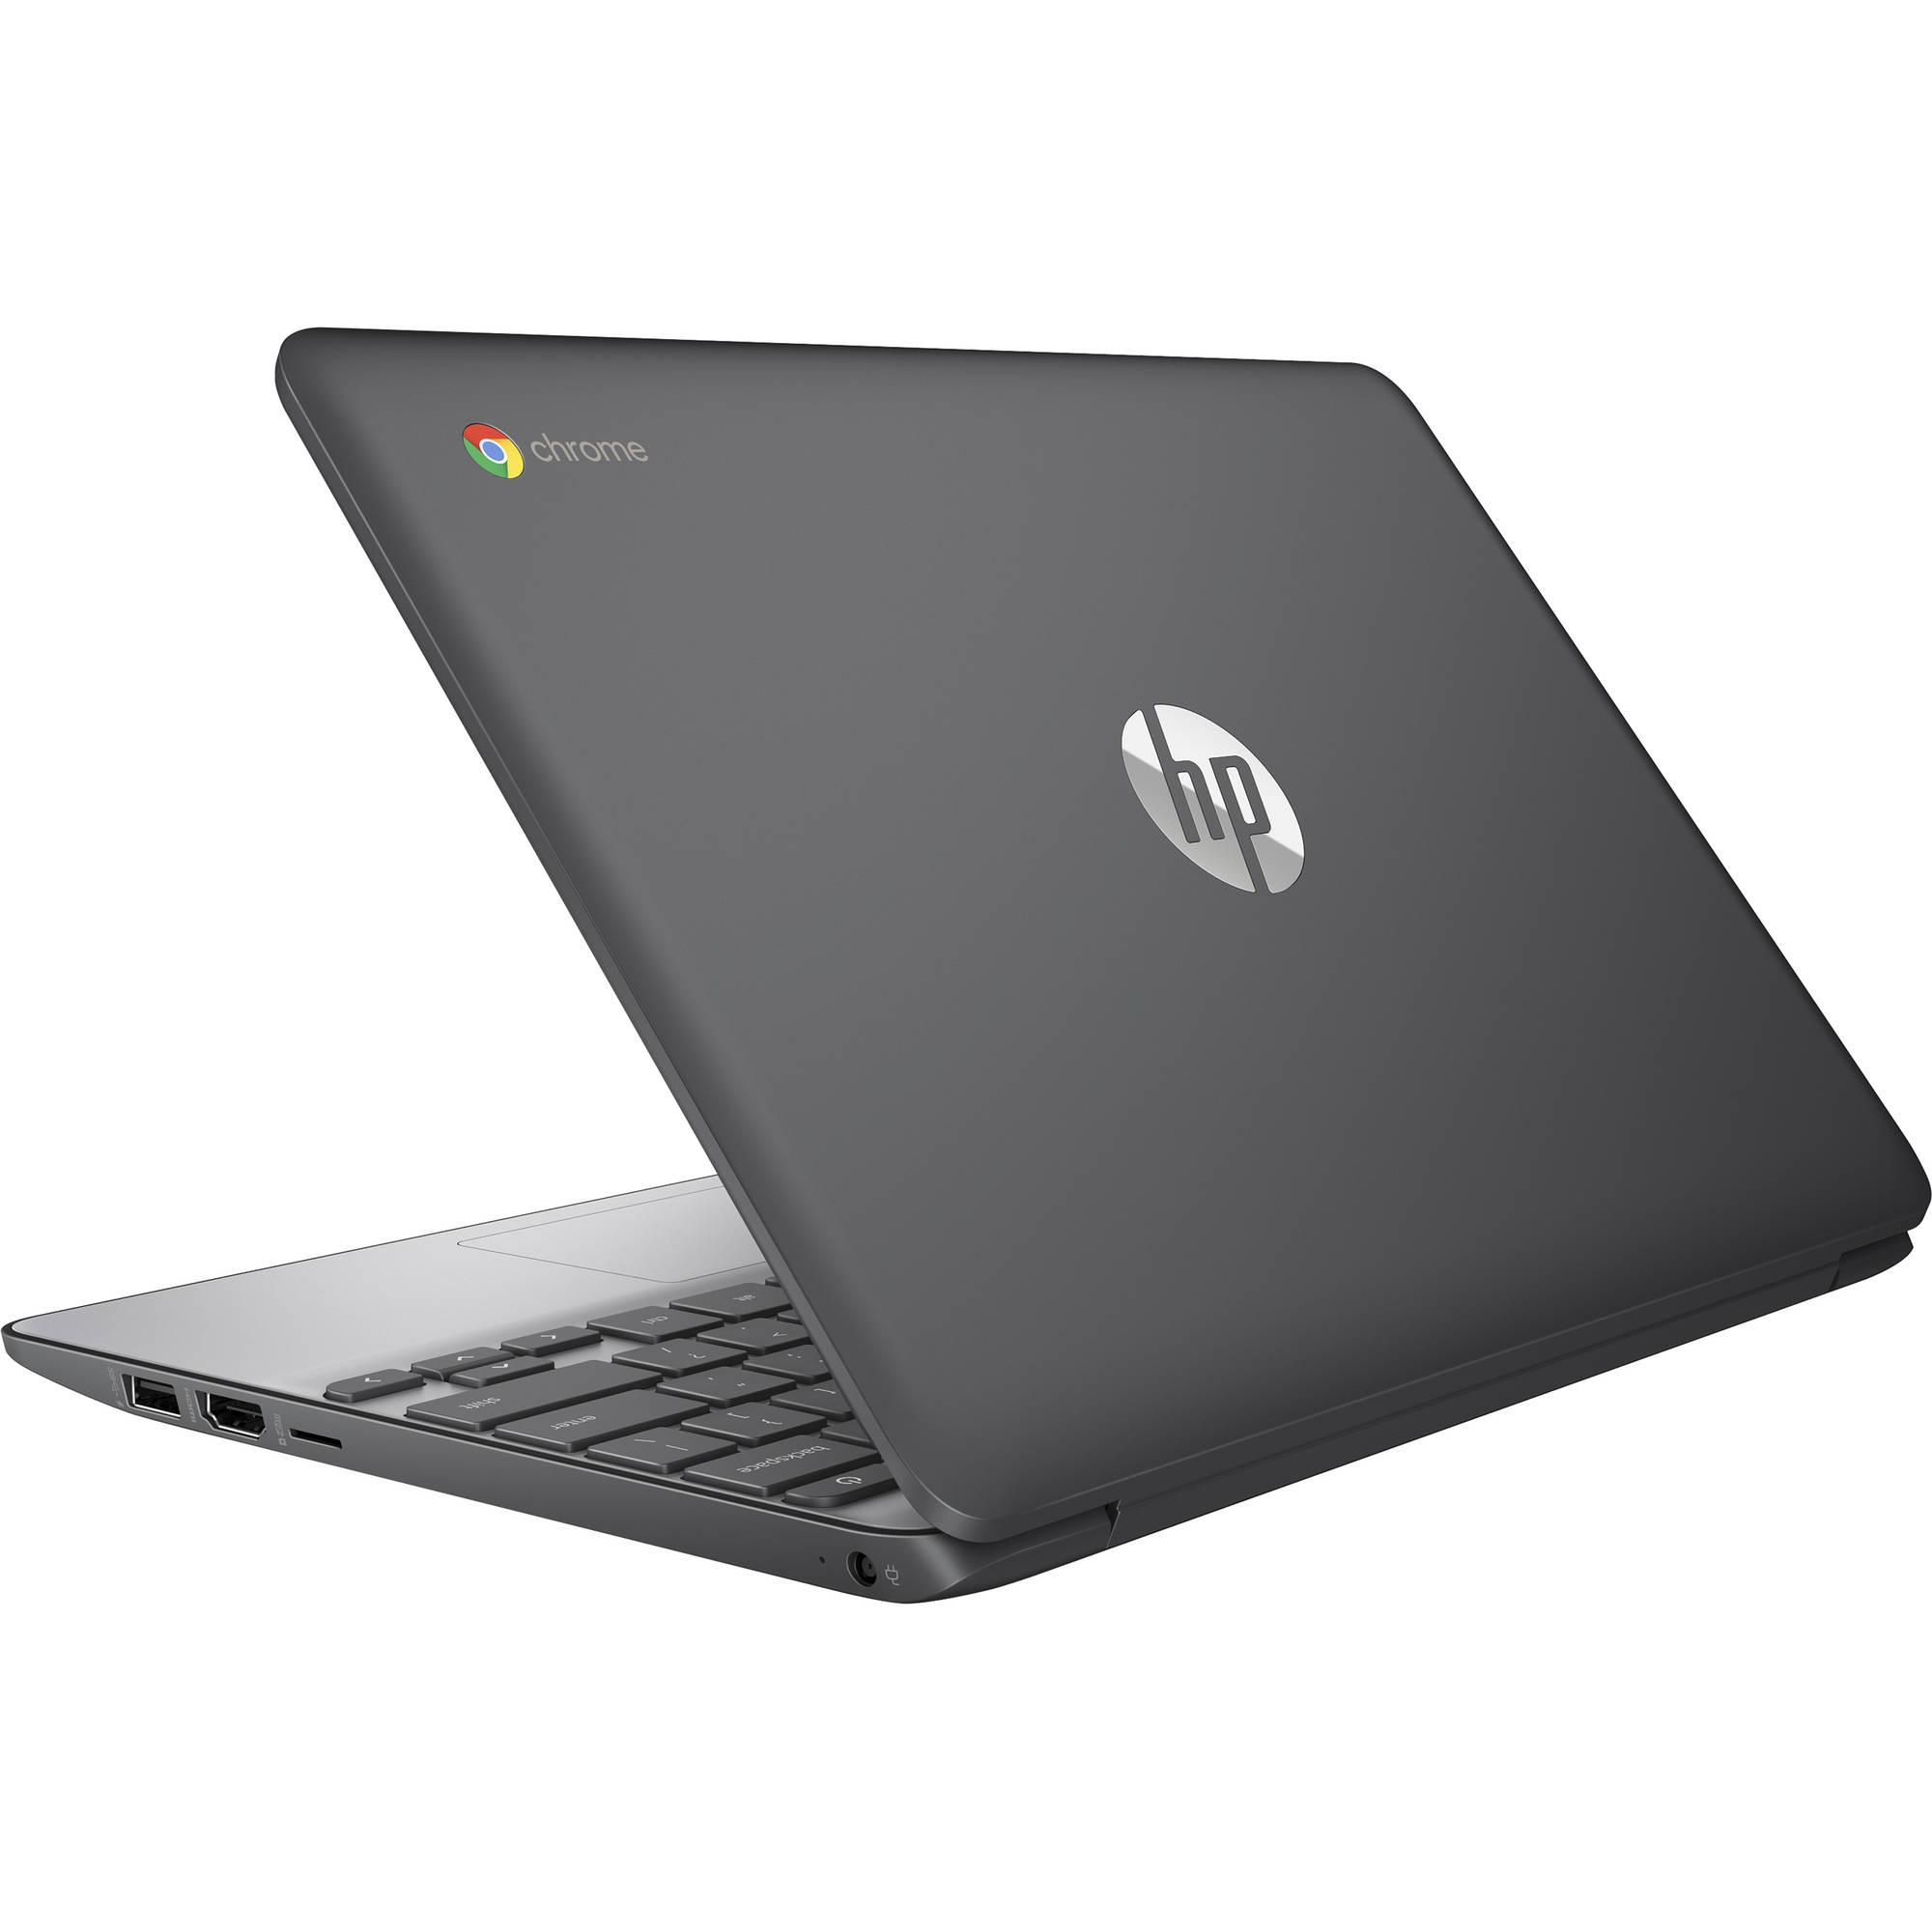 HP ChromeBook 11-V010NR Celeron N3060 1.6 GHz - SSD 16 GB - 4 GB